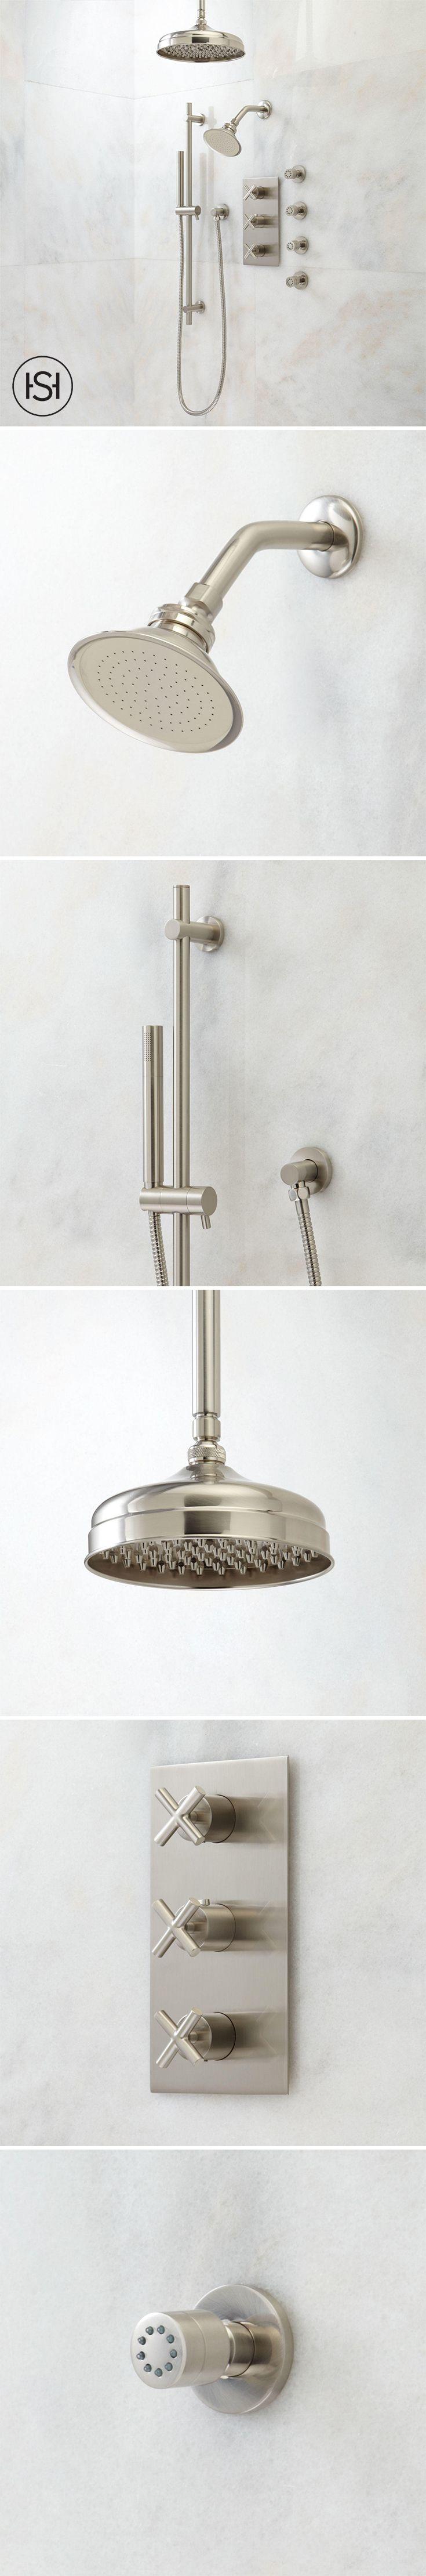 Best 25 Dual Shower Heads Ideas On Pinterest Double